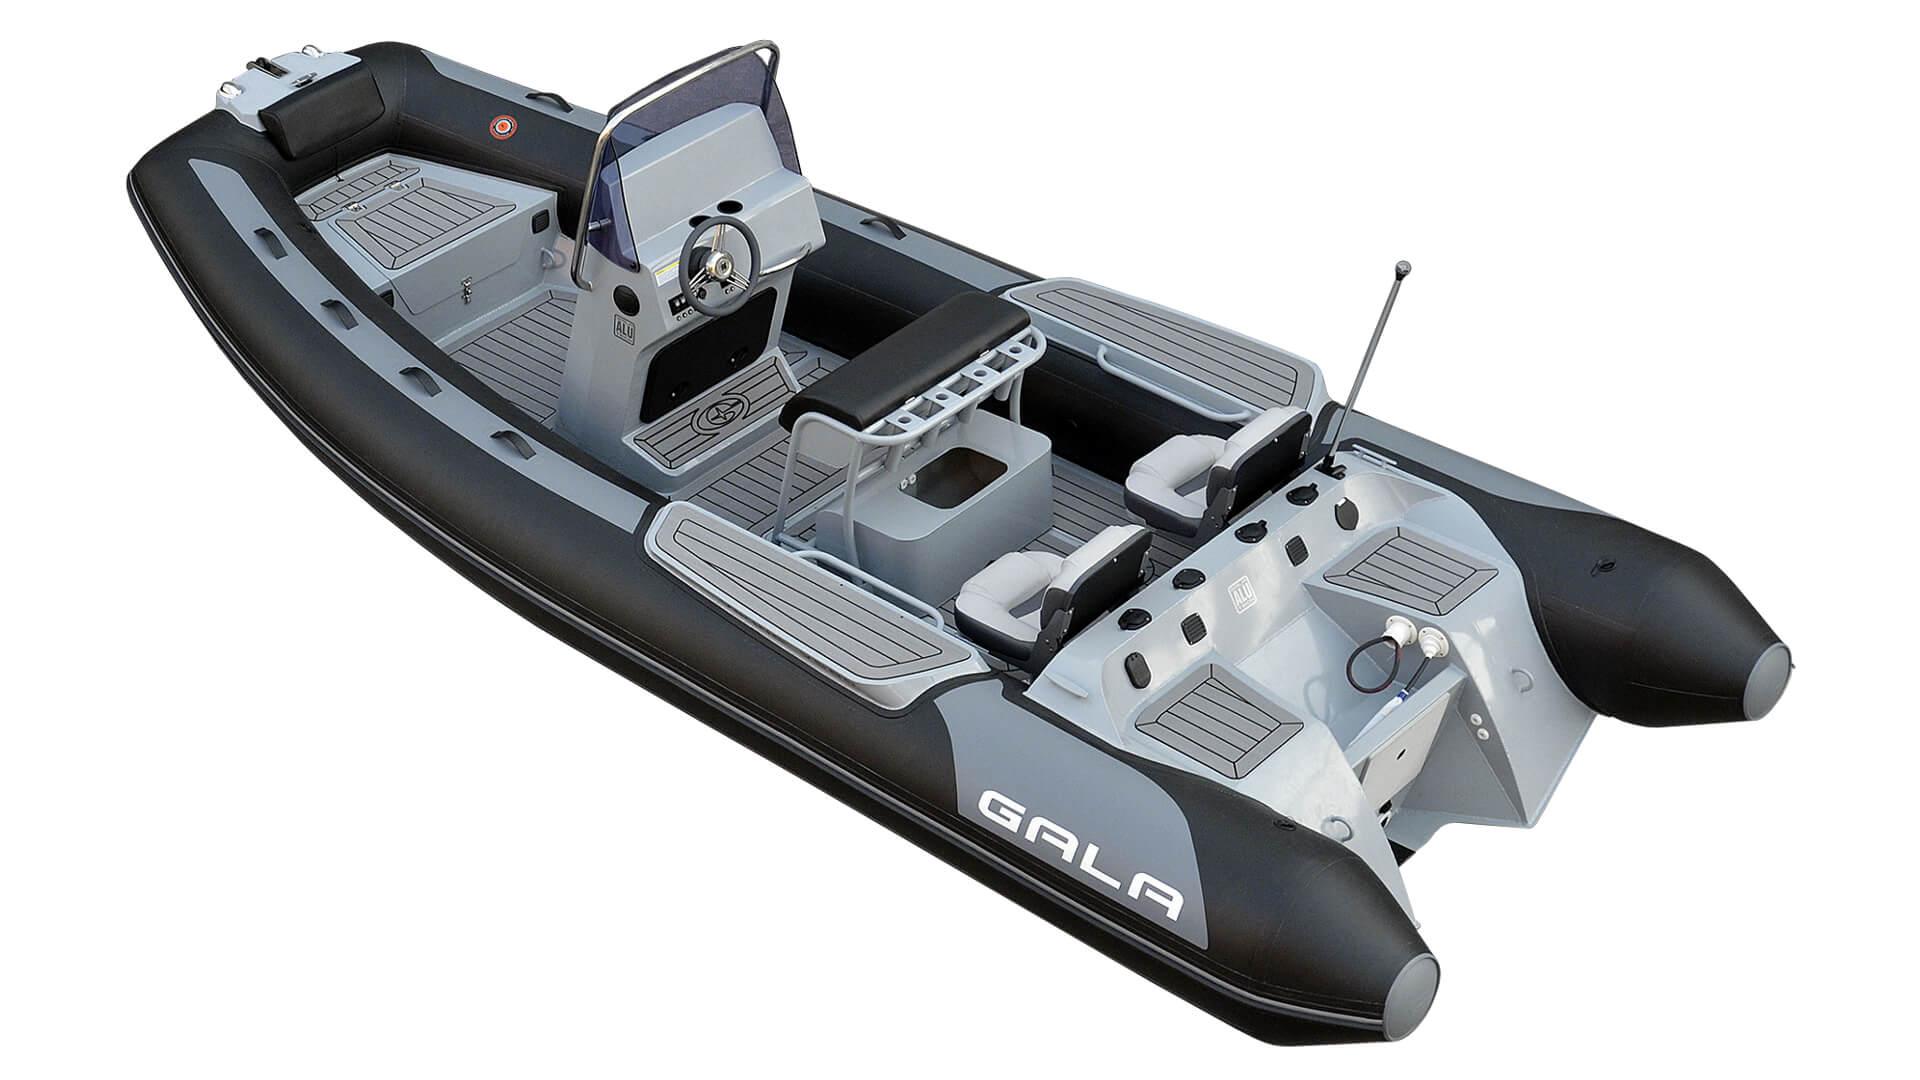 Надувная лодка с жестким алюминиевым дном GALA Viking V580F, Надувная лодка с жестким дном GALA Viking V580F, Надувная лодка с жестким дном GALA V580F, Надувная лодка GALA V580F, Надувная лодка GALA V580F, GALA V580F, лодка с жестким дном, алюминиевый риб, алюминиевый RIB, RIB